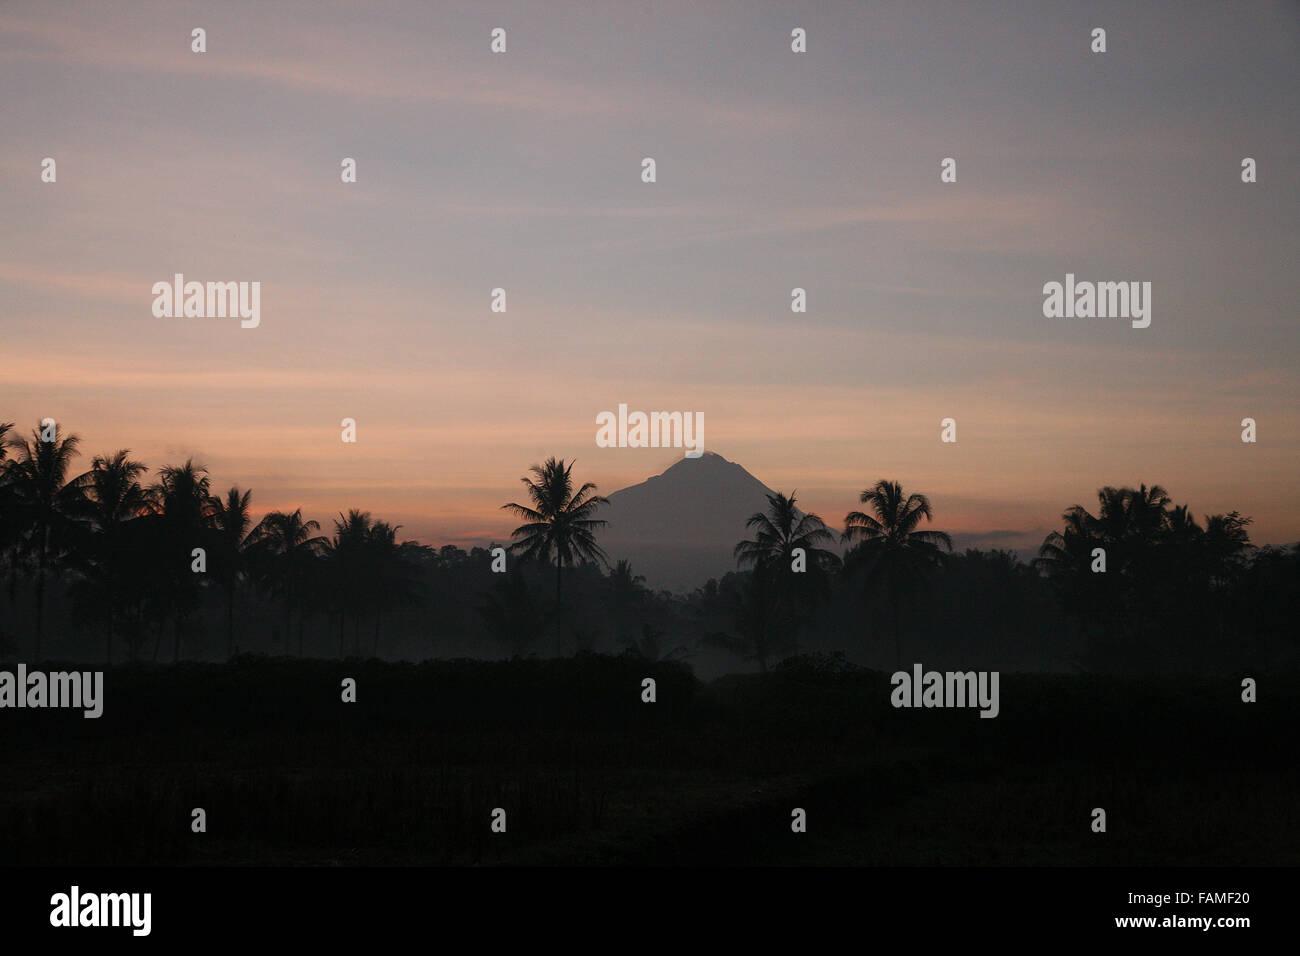 Indonesia Central Java Magelang Mount Merapi at sunrise  Adrian Baker - Stock Image